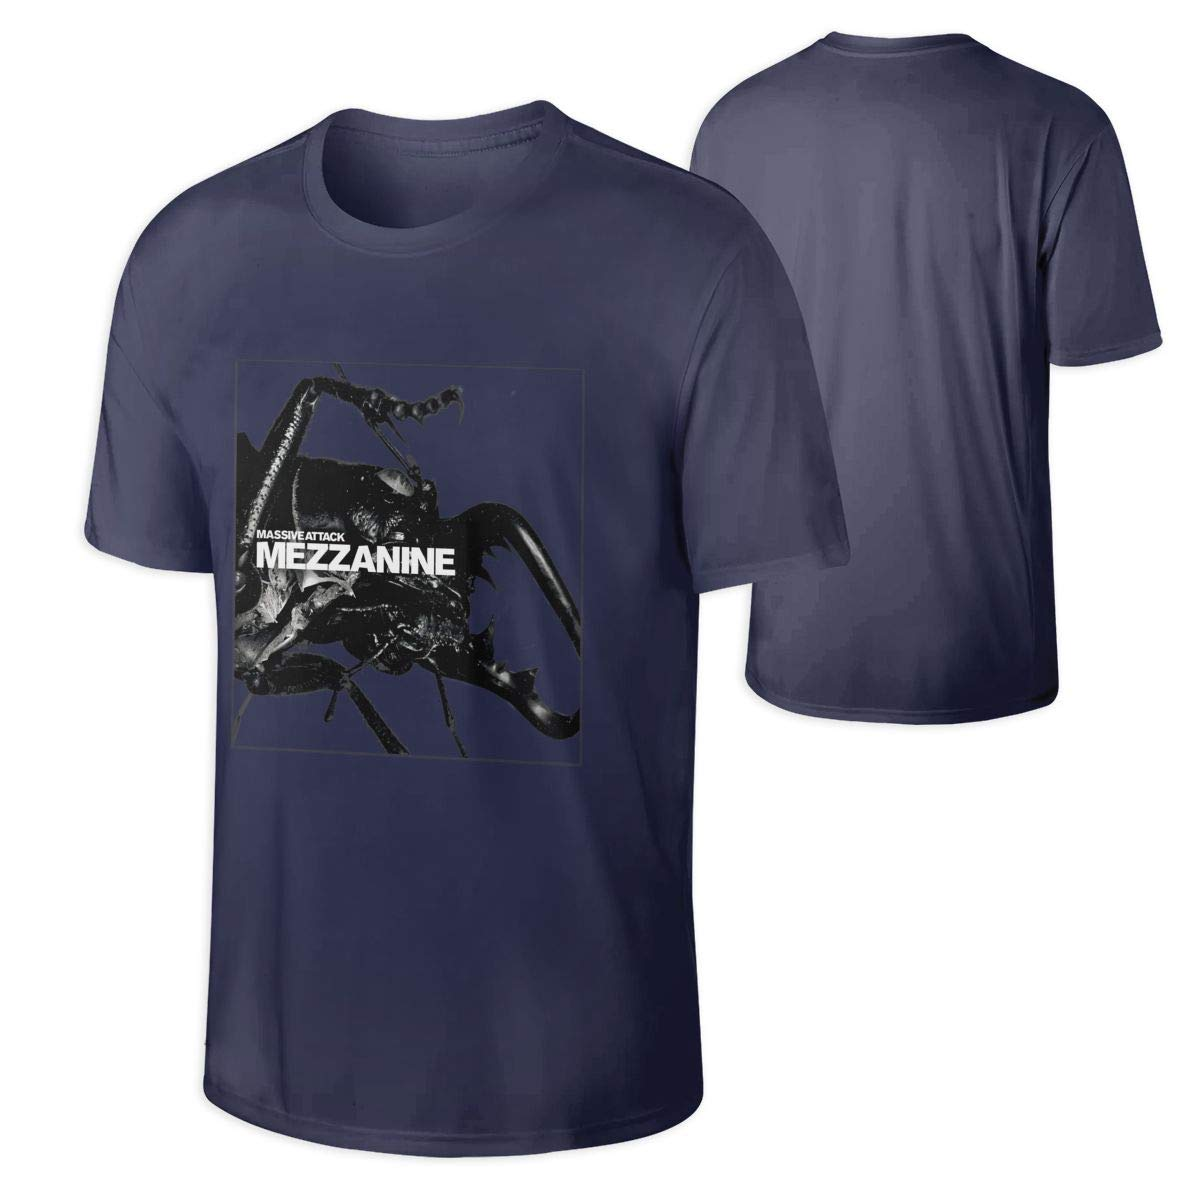 Massive Attack Mezzanine Cool Tee Music Band Tshirt Black